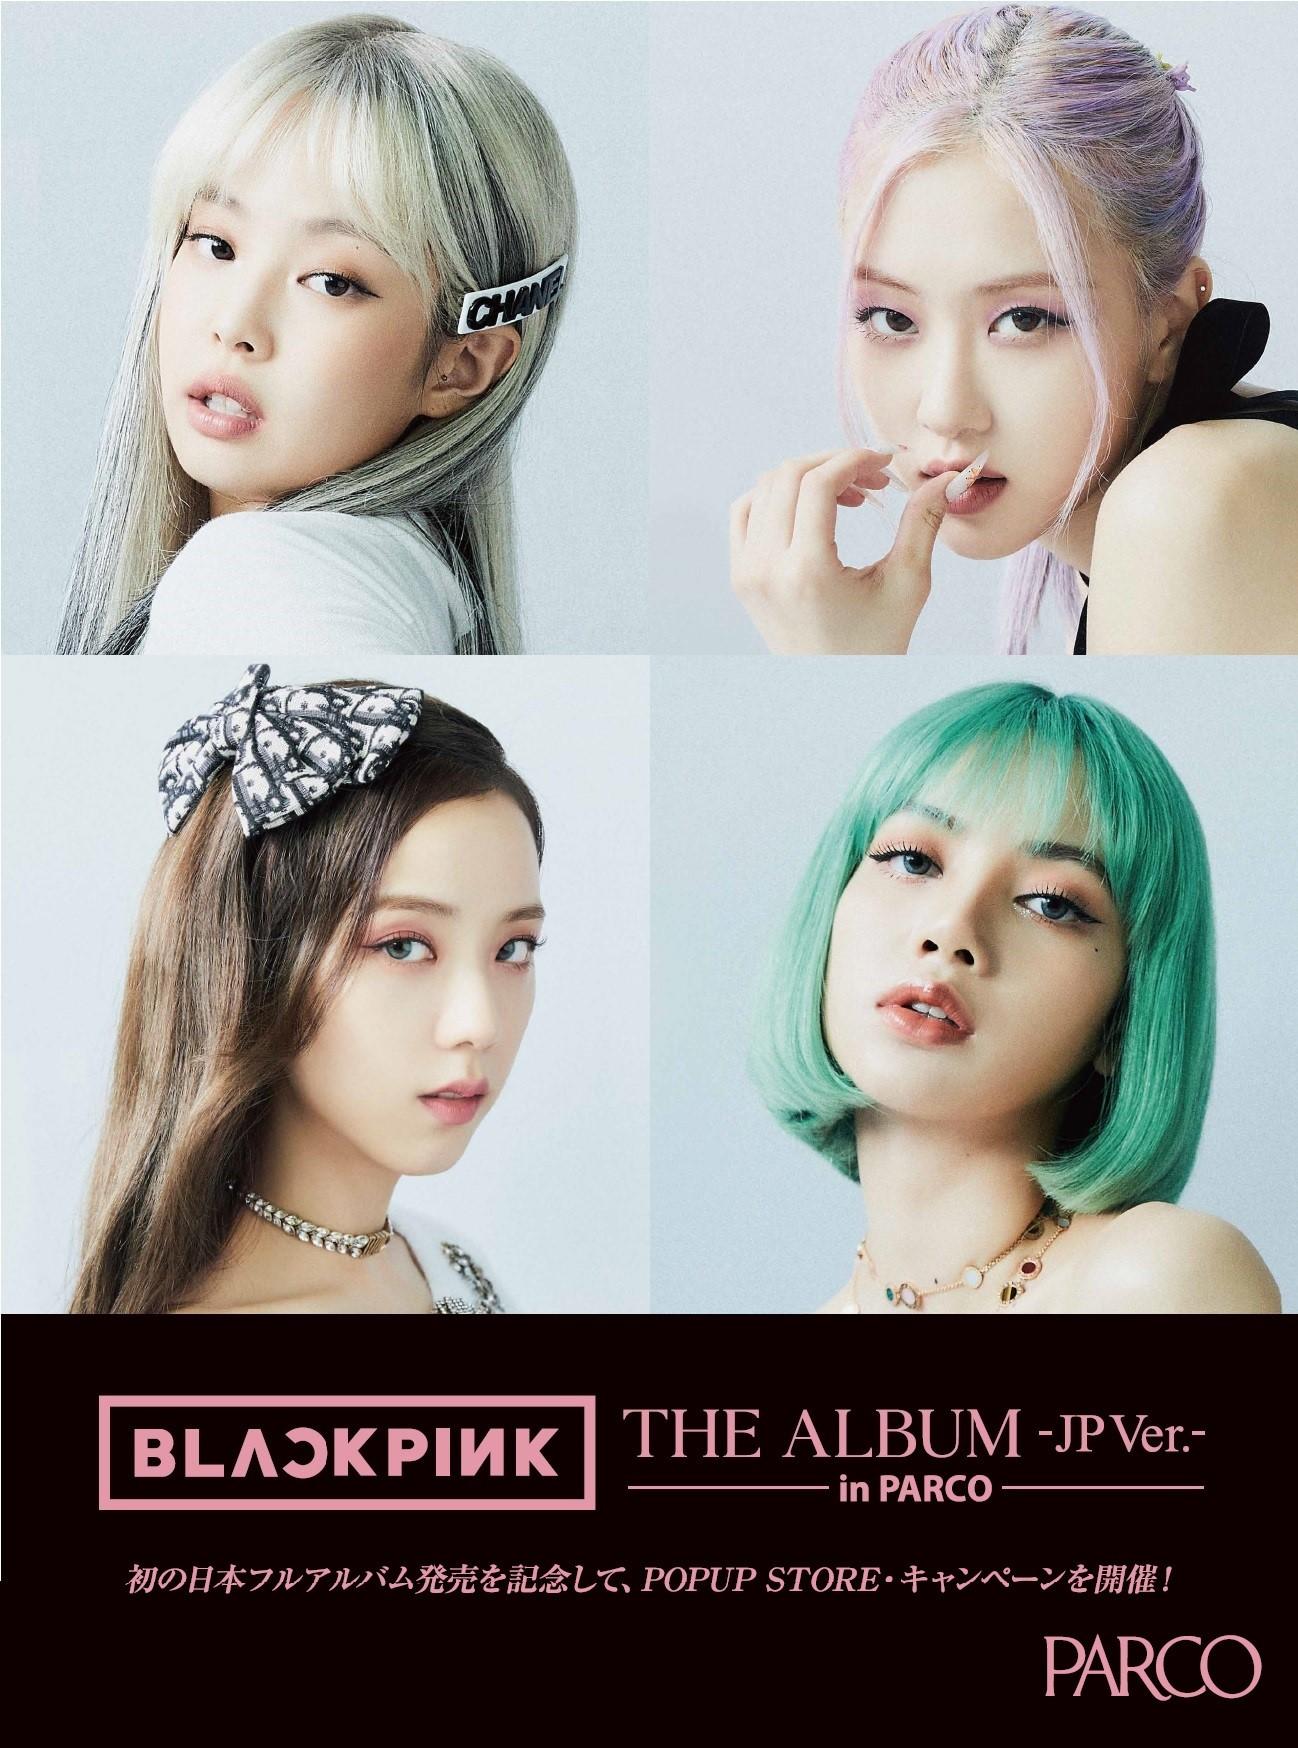 BLACKPINK「THE ALBUM –JP Ver.-」inPARCOのメインビジュアル